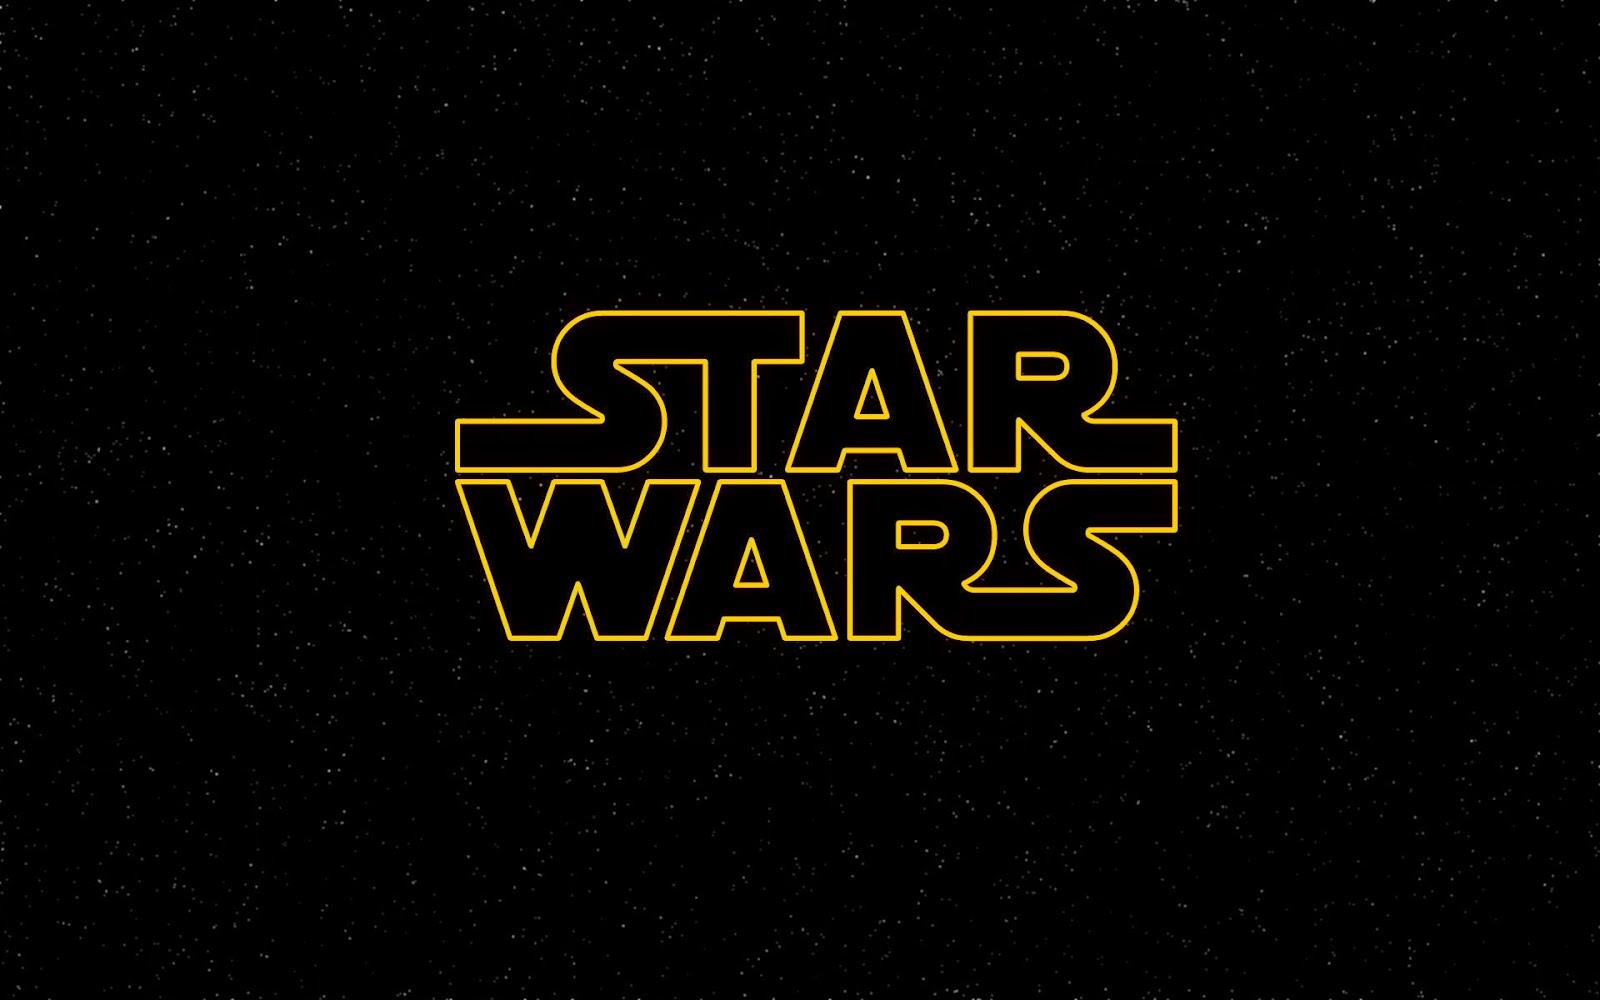 star-wars-logo-stars.jpg